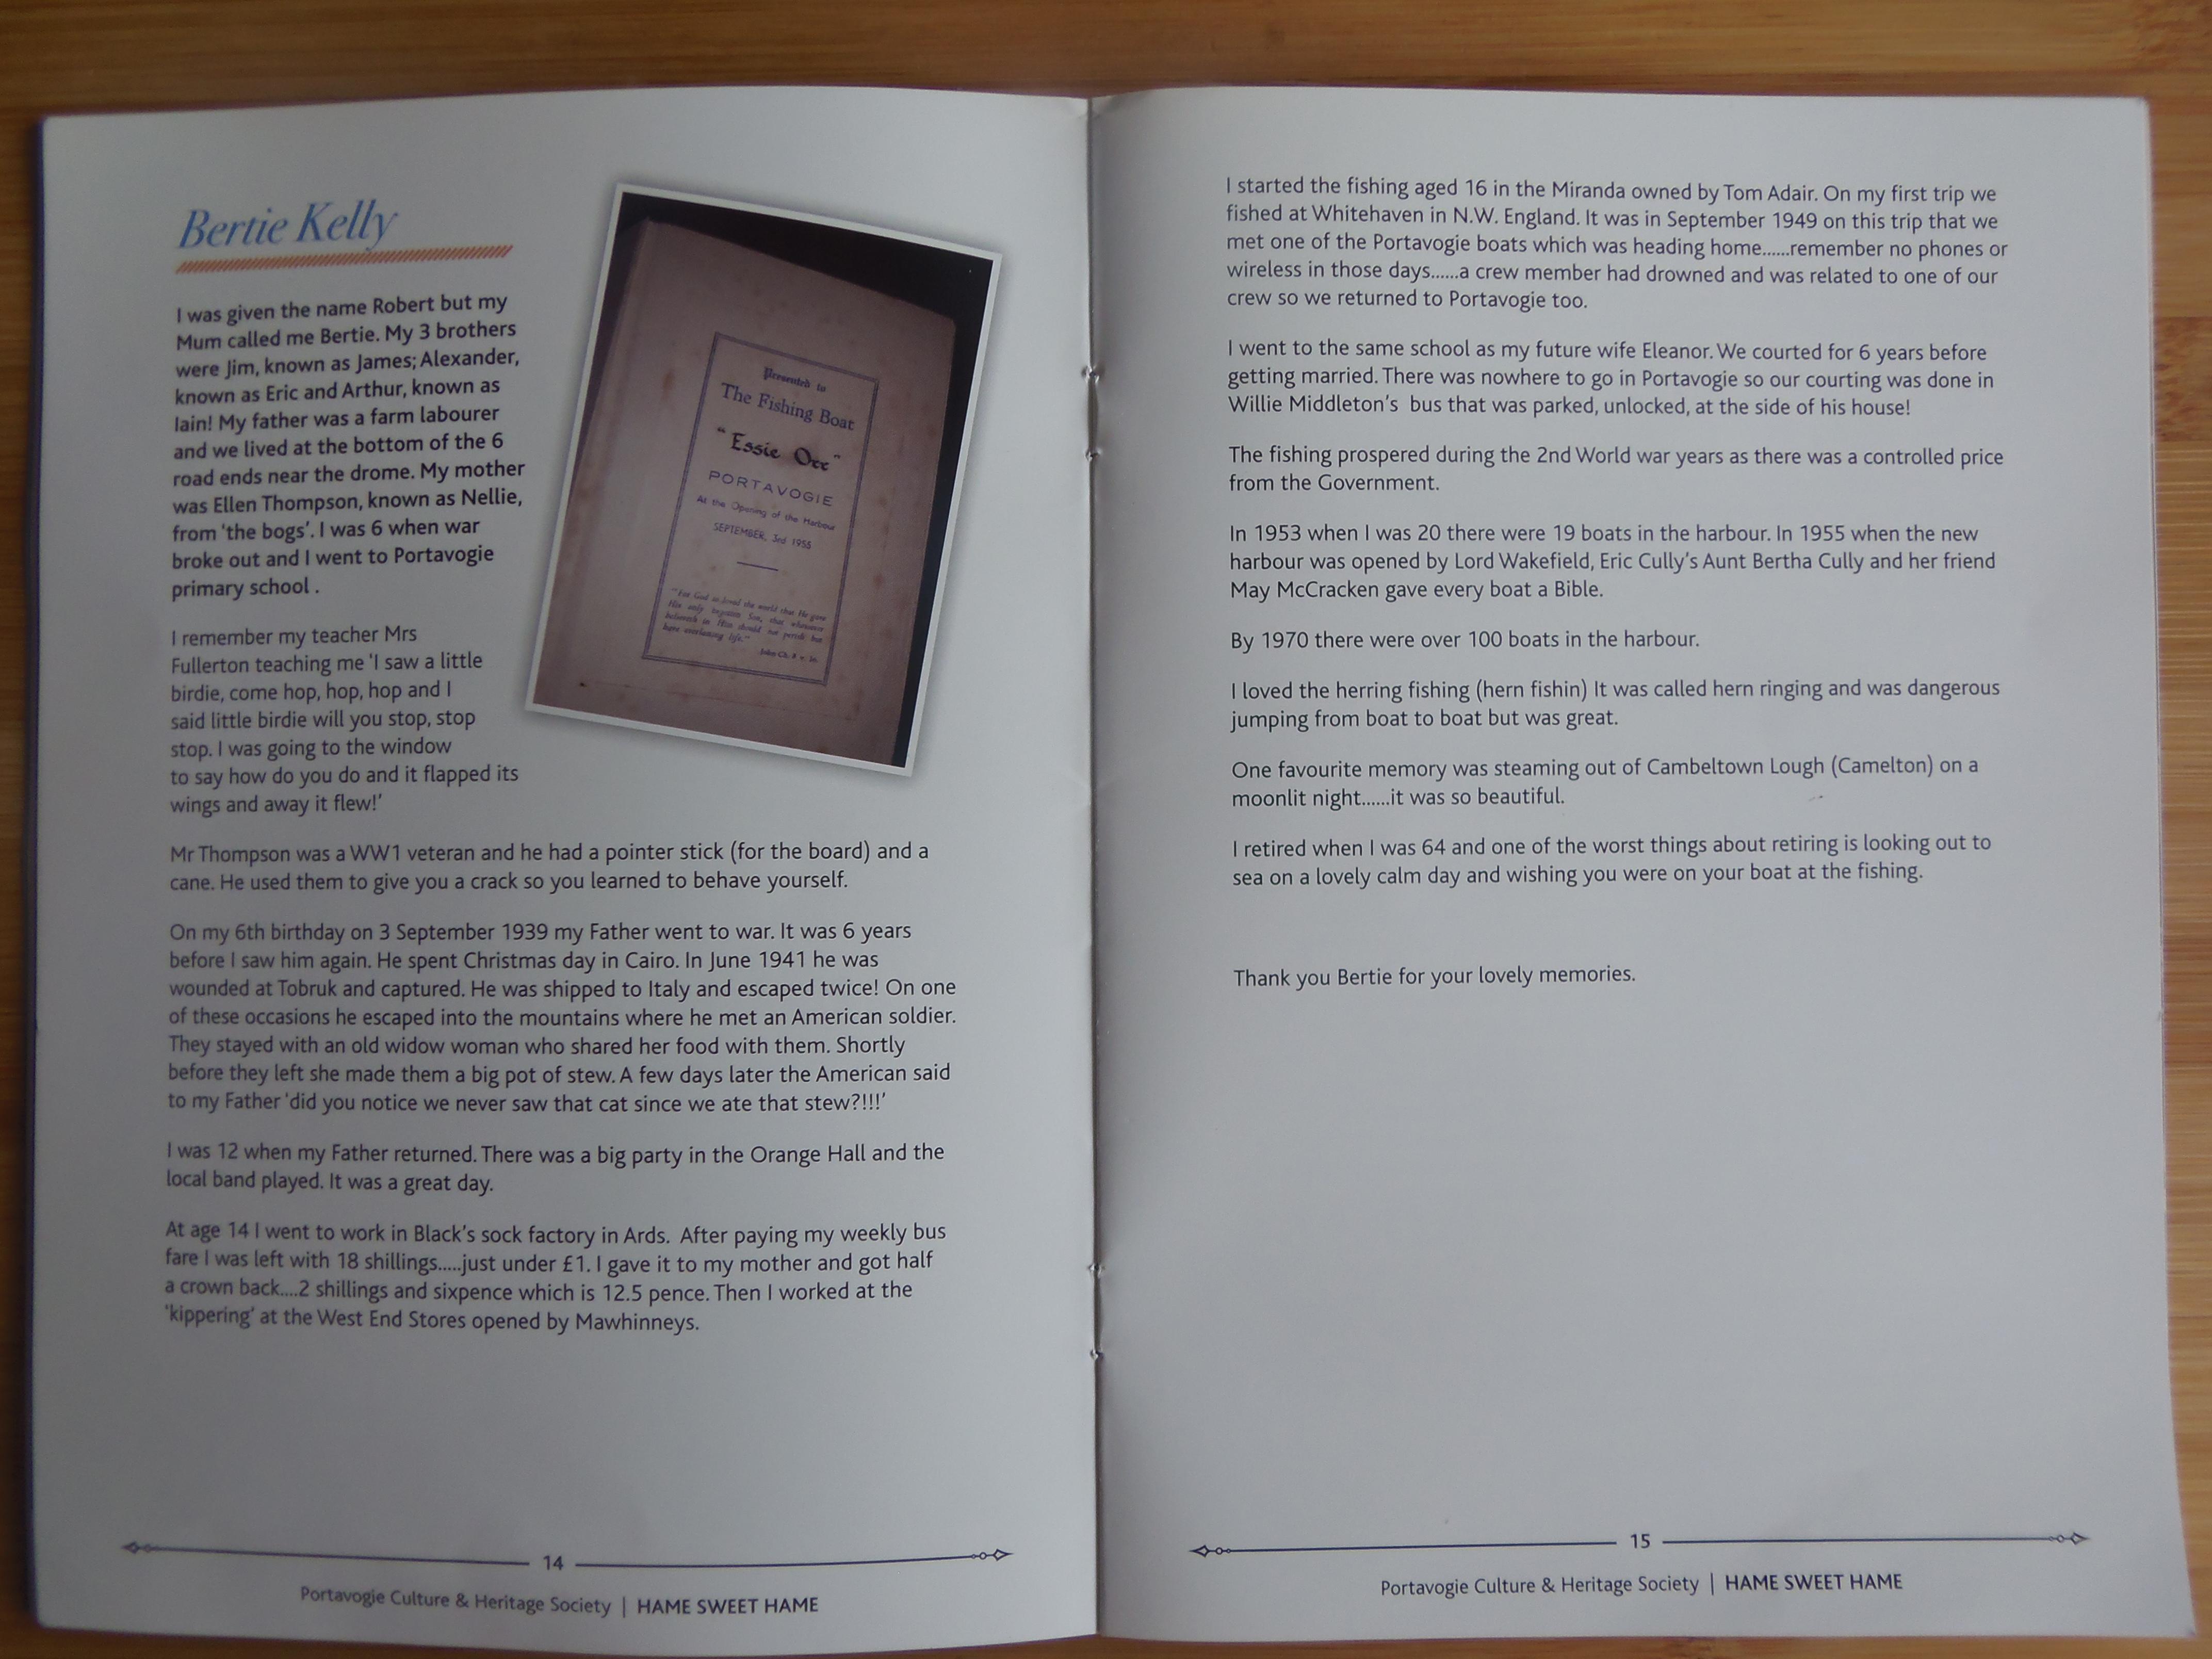 pg 14-15